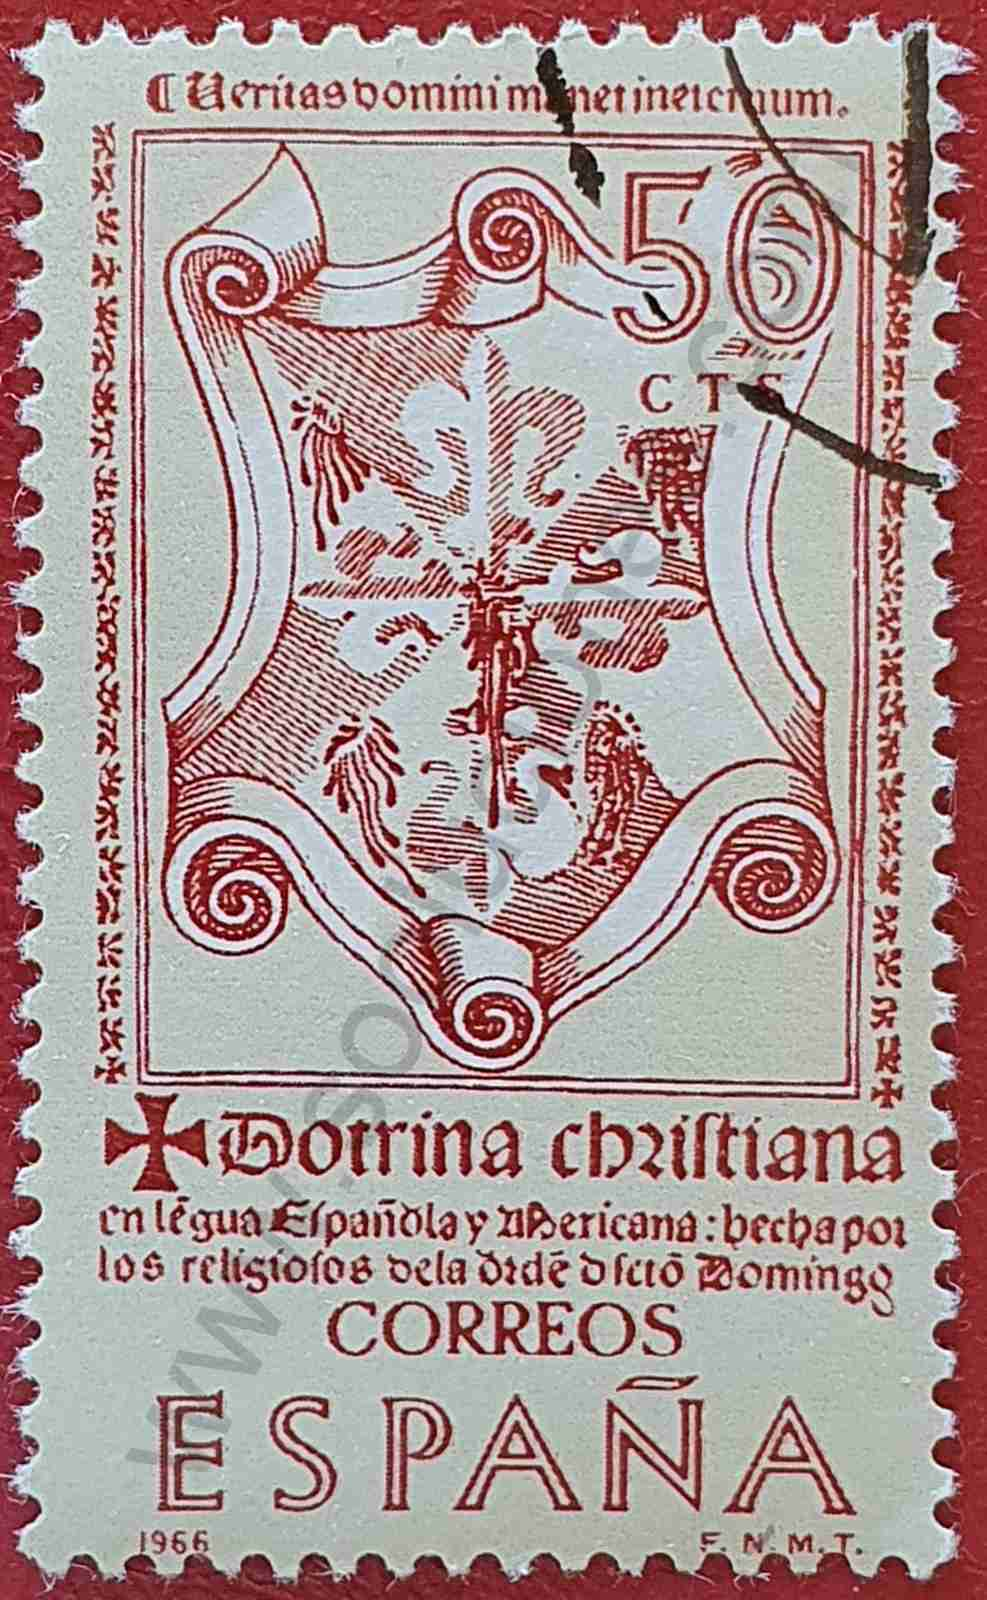 La doctrina Cristiana - Sello España 1966